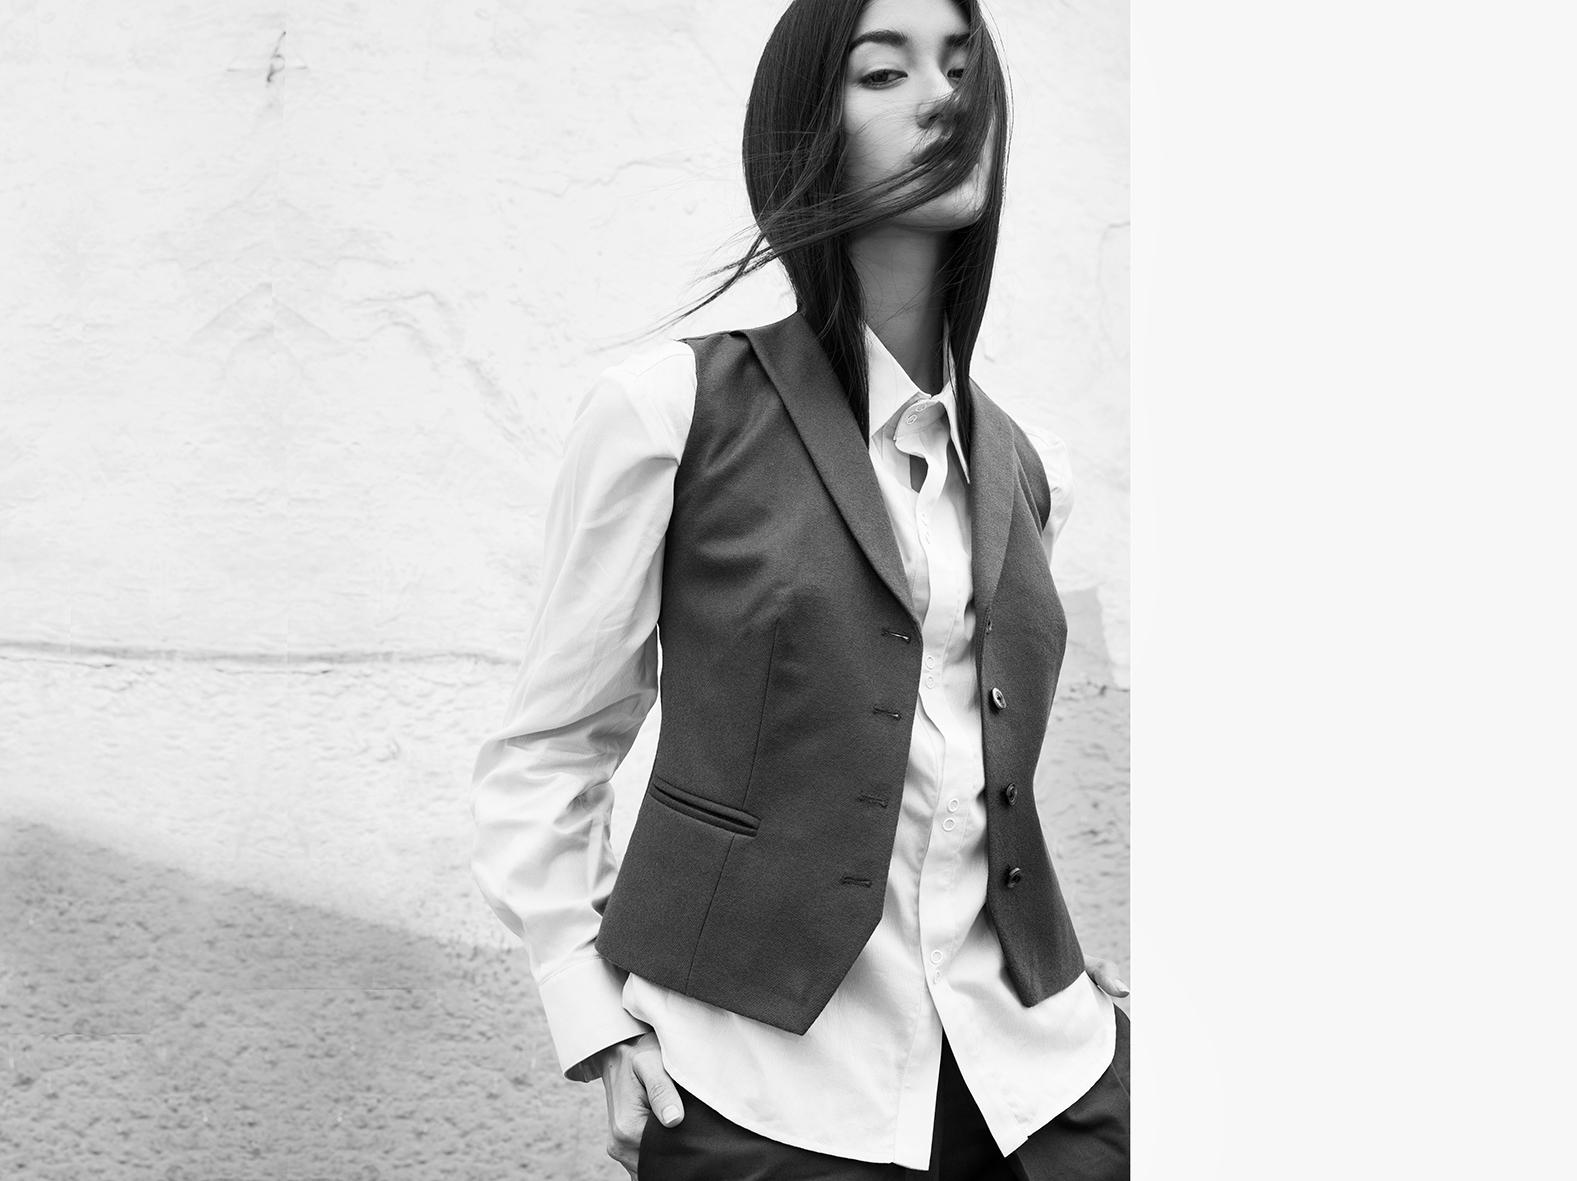 D Emiko Tokuda Editorial Fashion Photography Manuel Palacios Espinoza 2016 Peru Lima Moda Peruana - 05.jpg